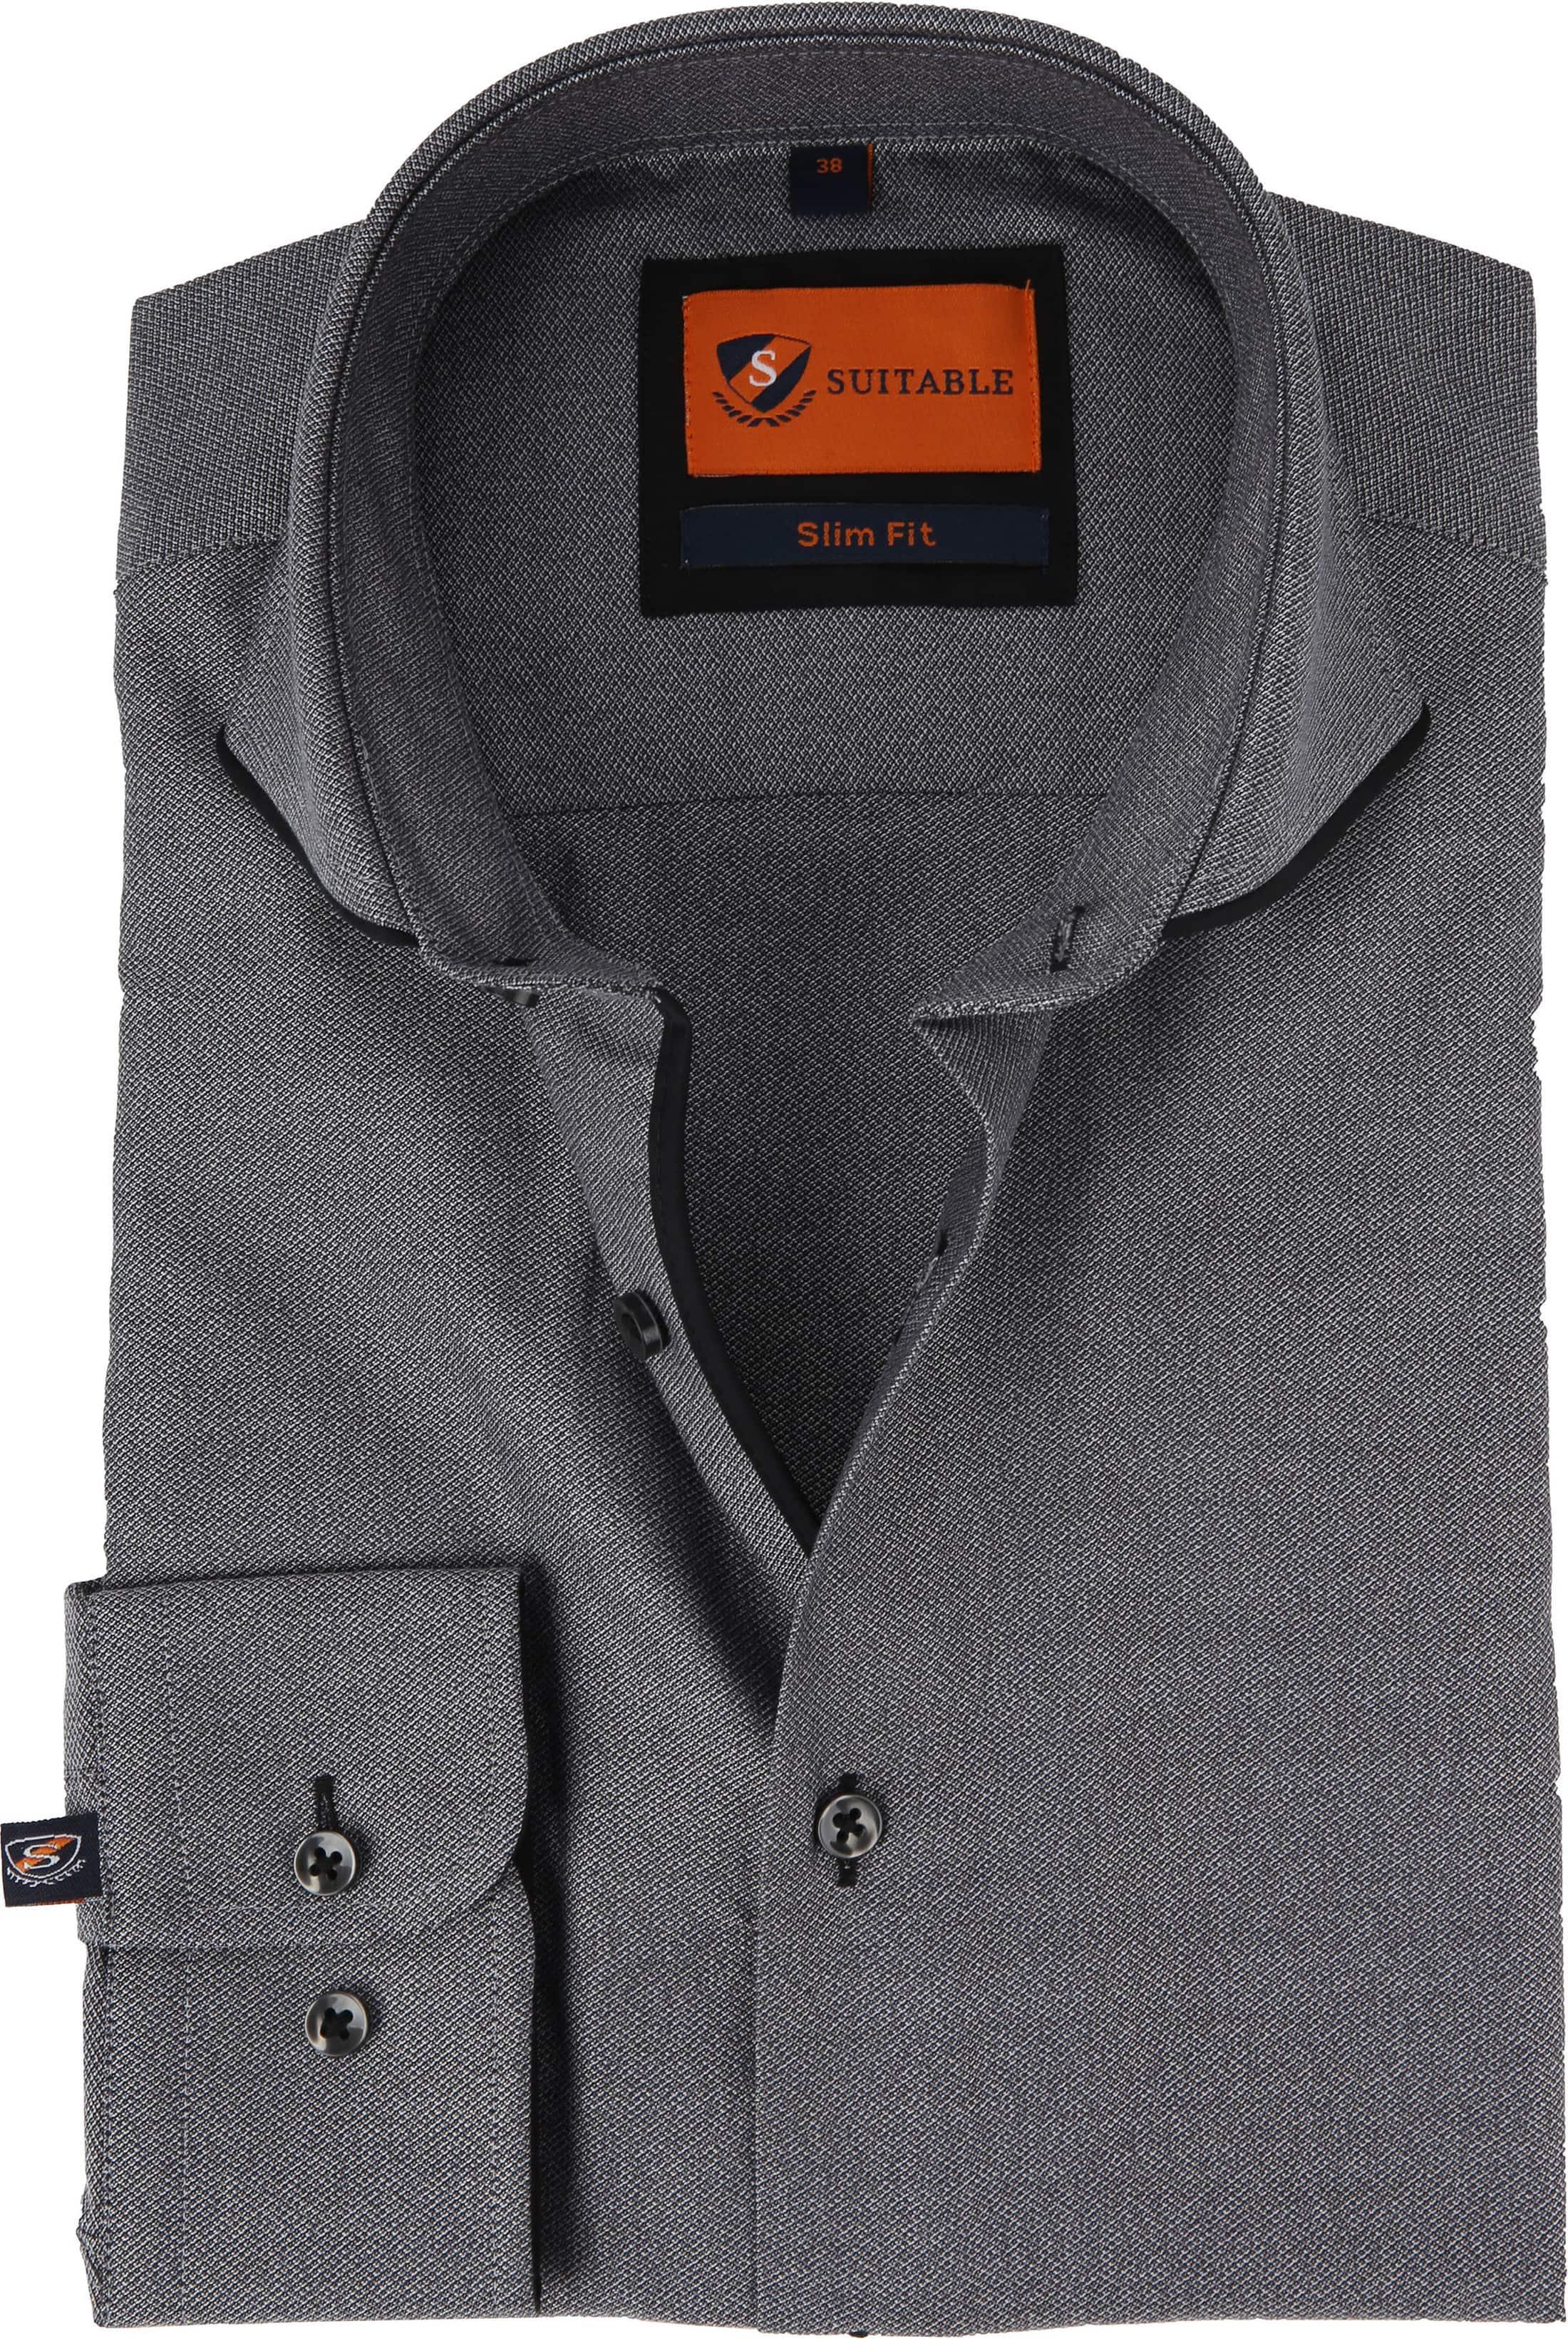 Suitable Overhemd Mouline Grijs foto 0